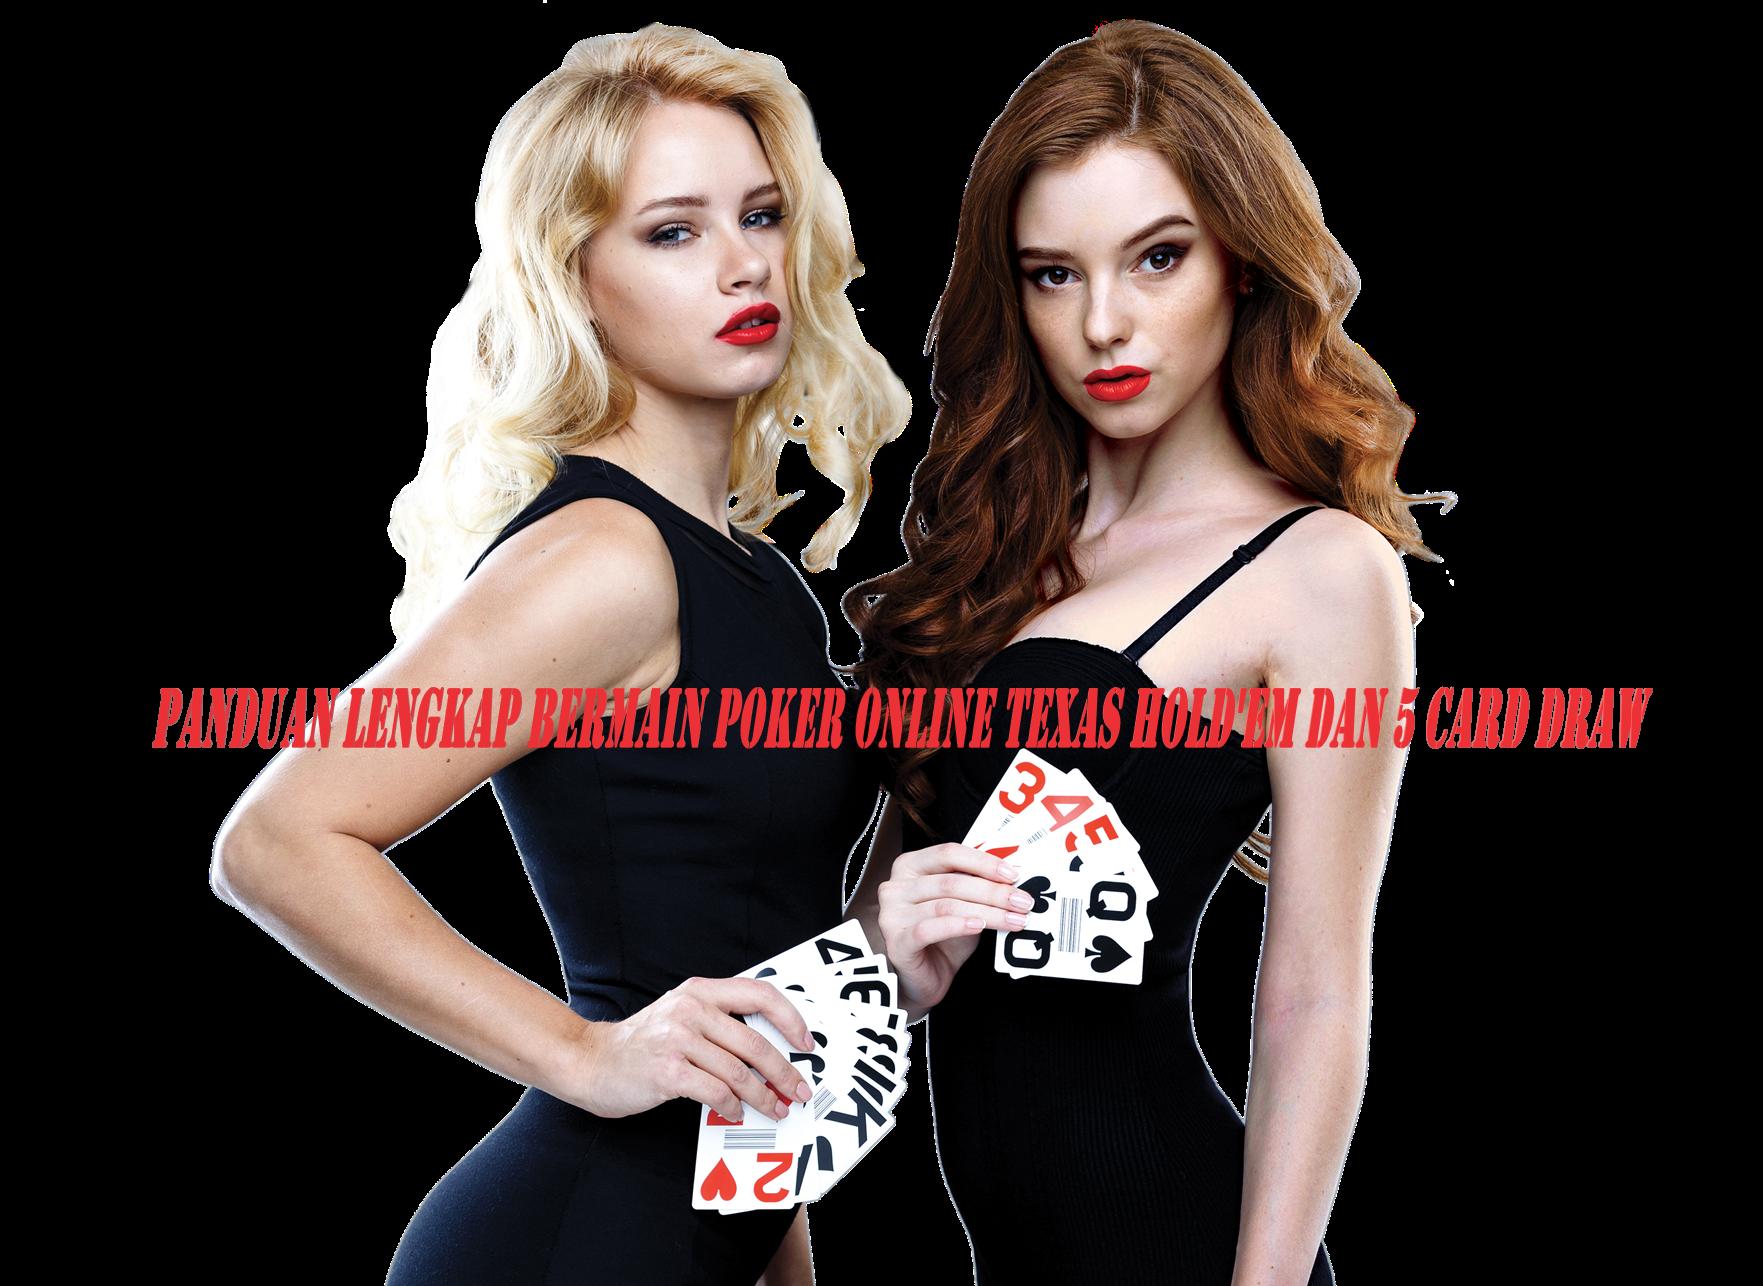 Panduan Lengkap Bermain Poker Online Texas Hold'em dan 5 Card Draw